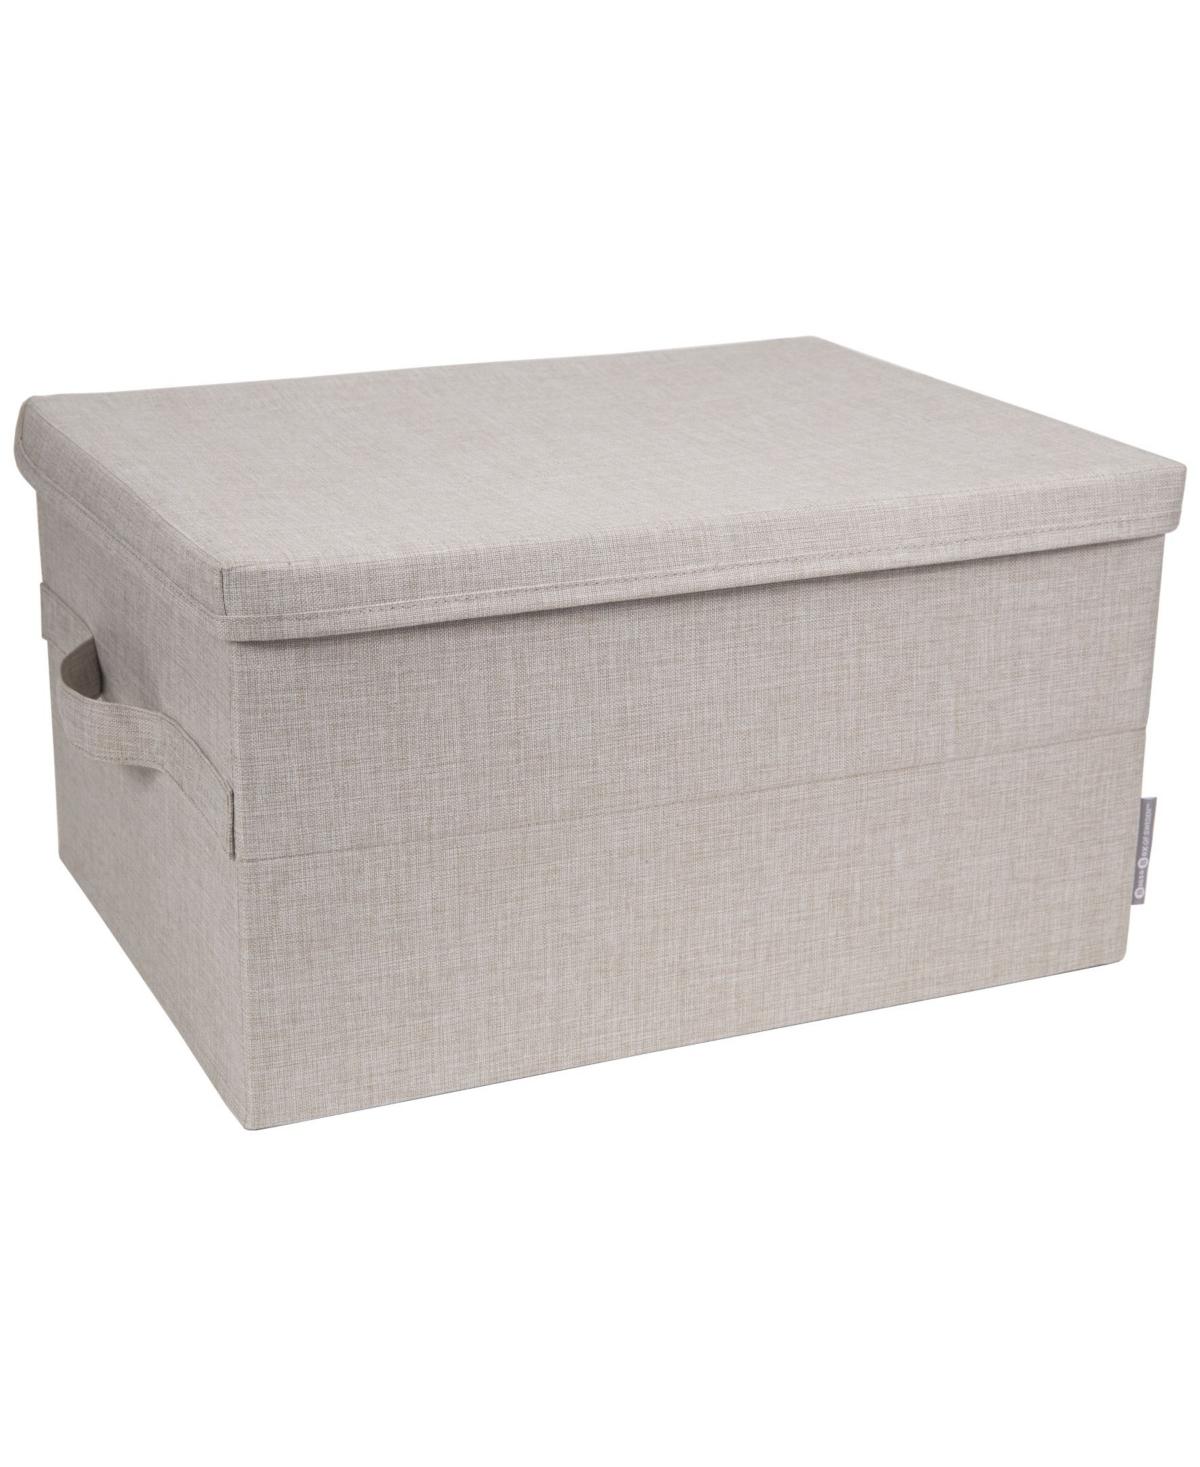 Bigso Box of Sweden Soft Storage Large Storage Box